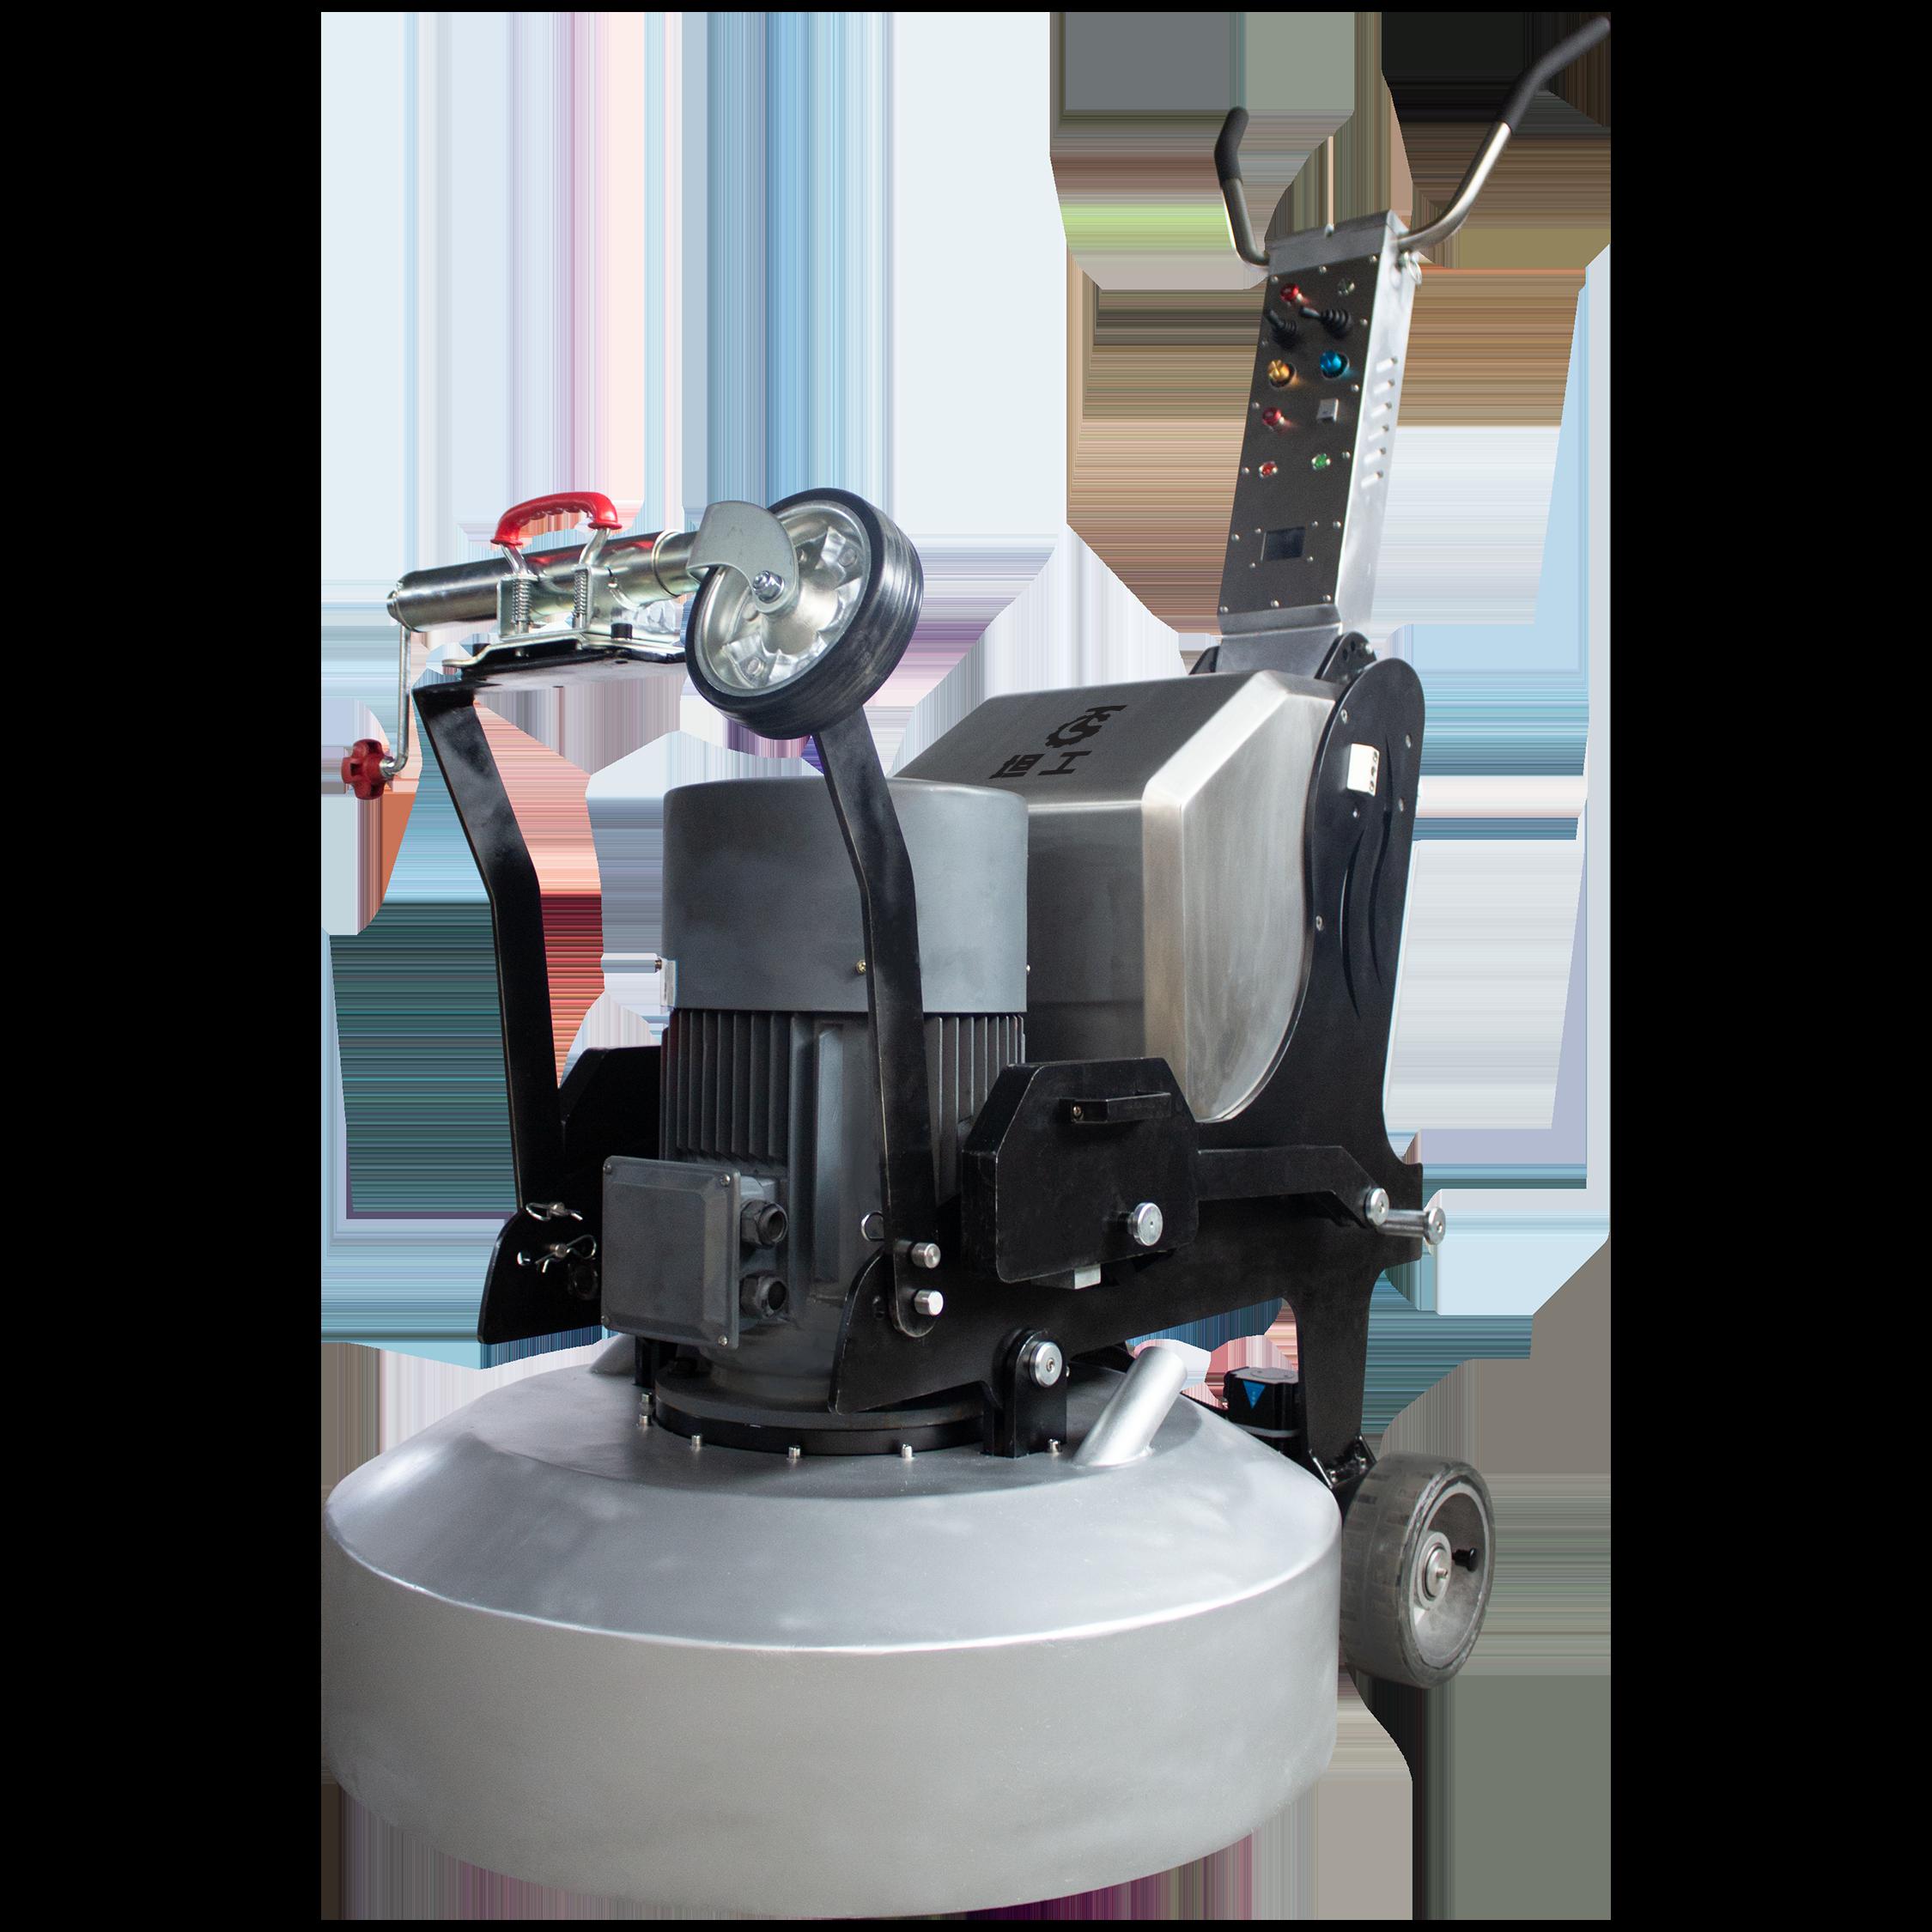 Planetary rotating floor grinder machine,Curing floor grinder for sale,buy floor grinder equipment unit